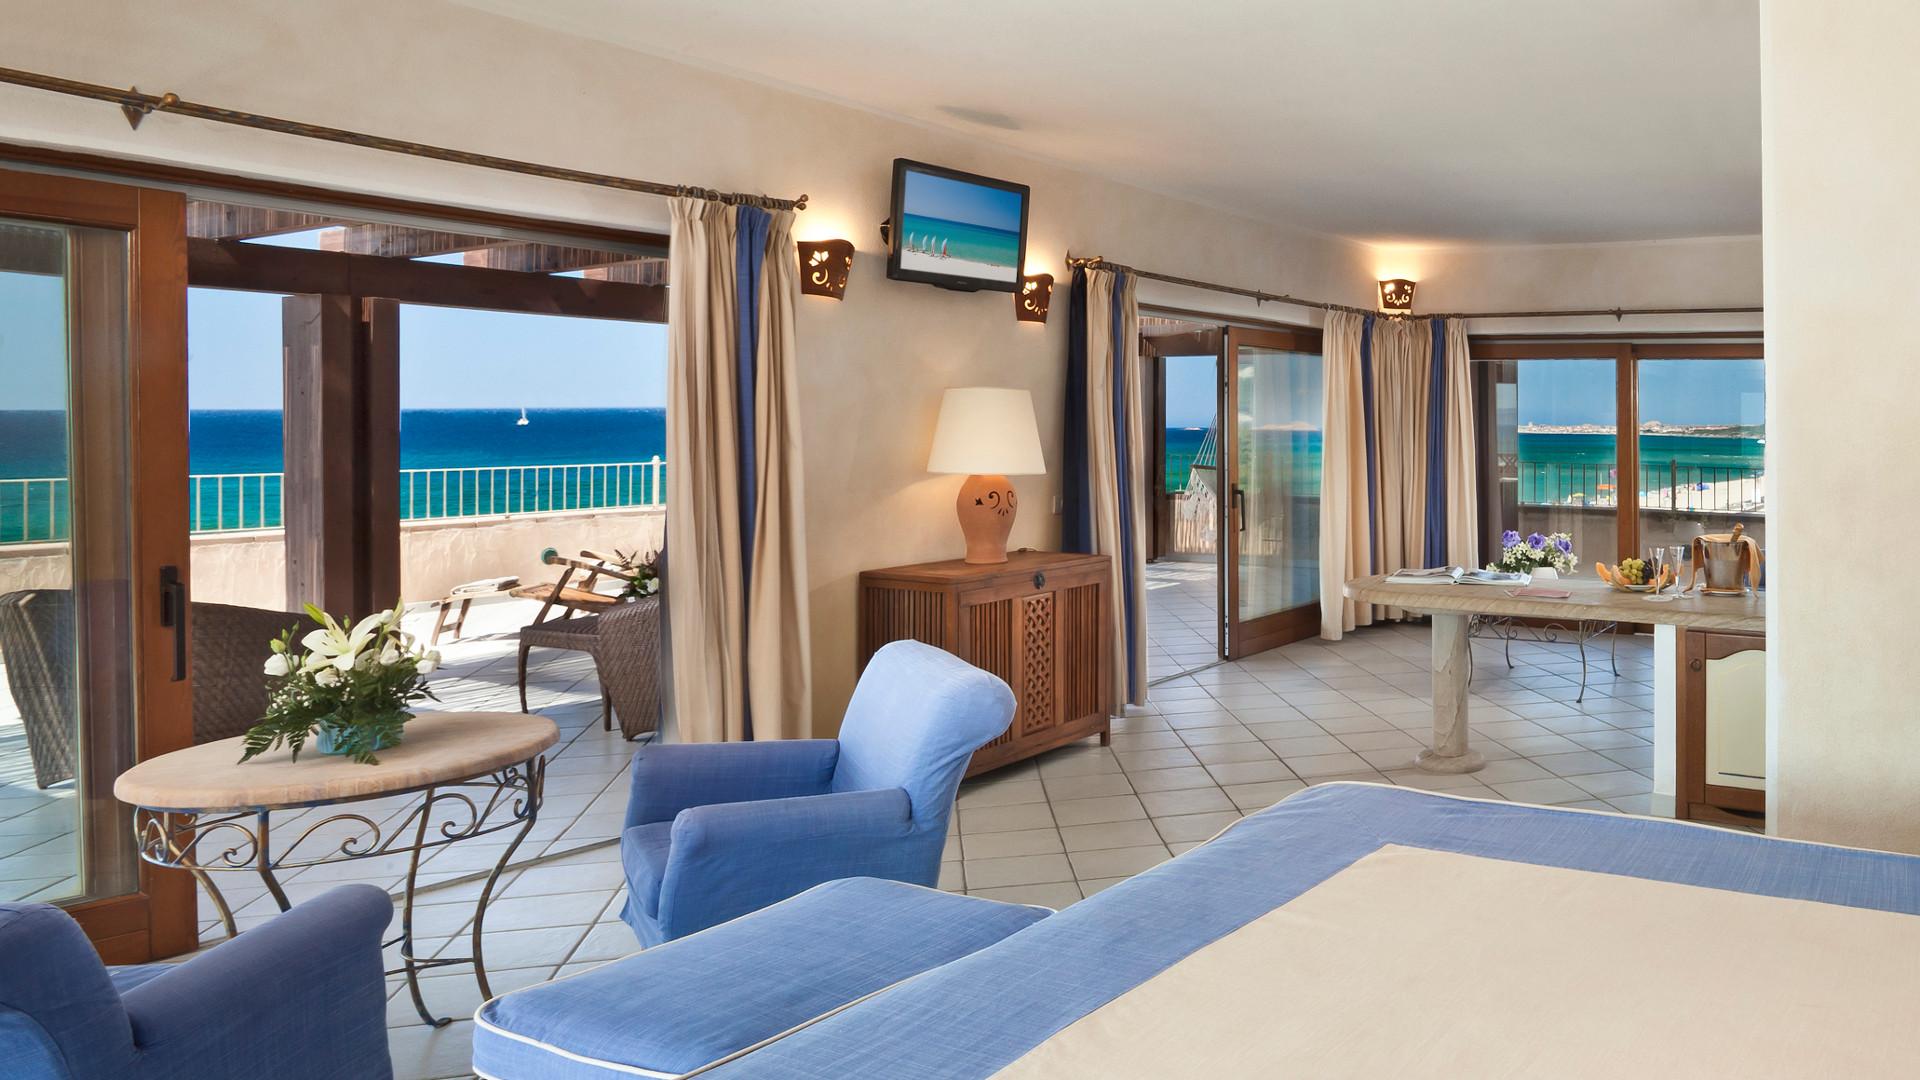 resort-le-dune-slider-duna-bianca-vista-mare-badesi-1